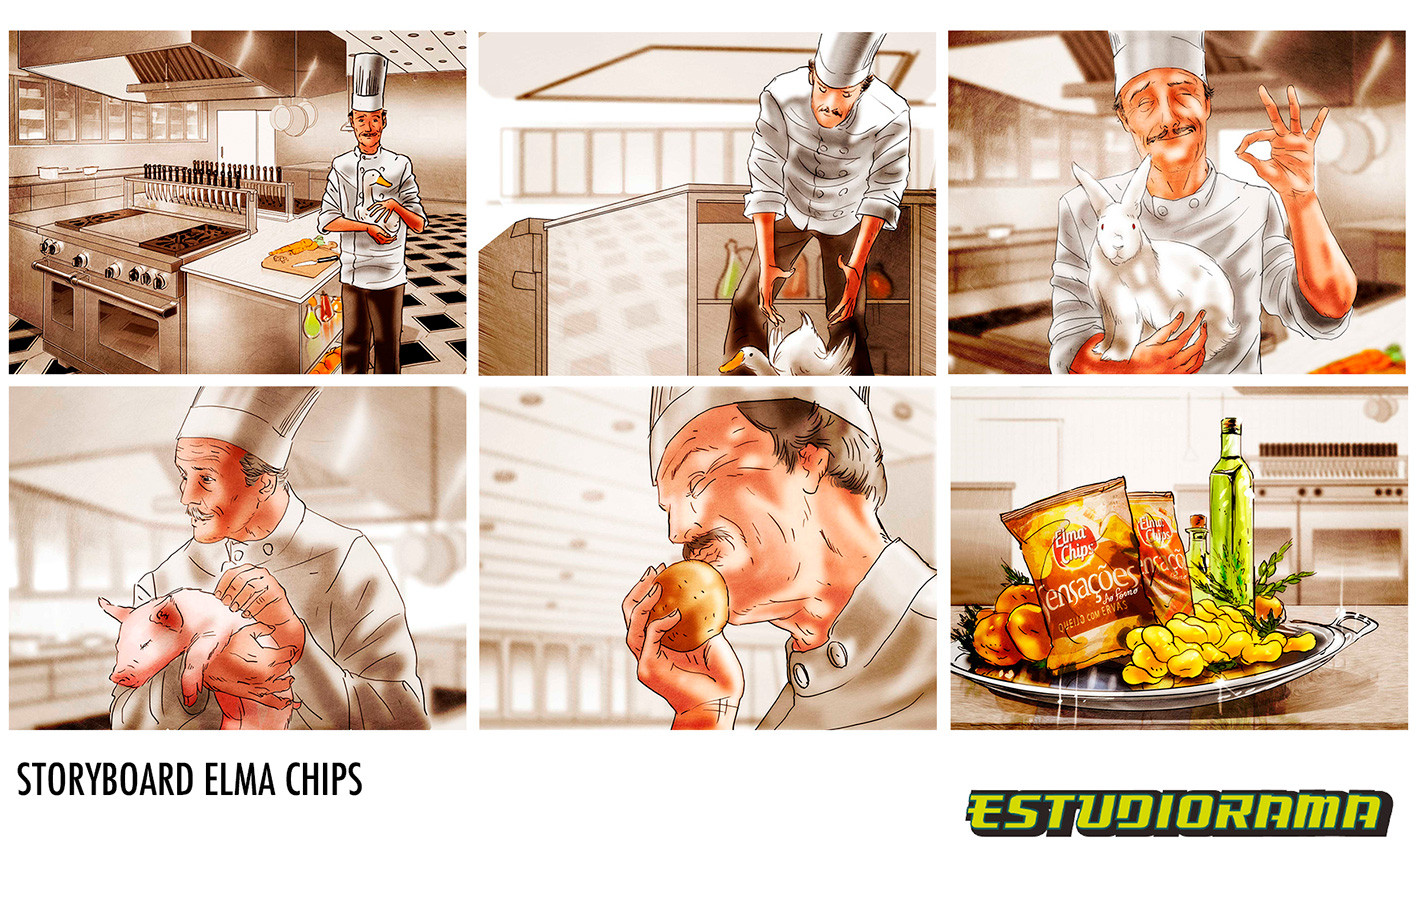 stb-elma-chips.jpg